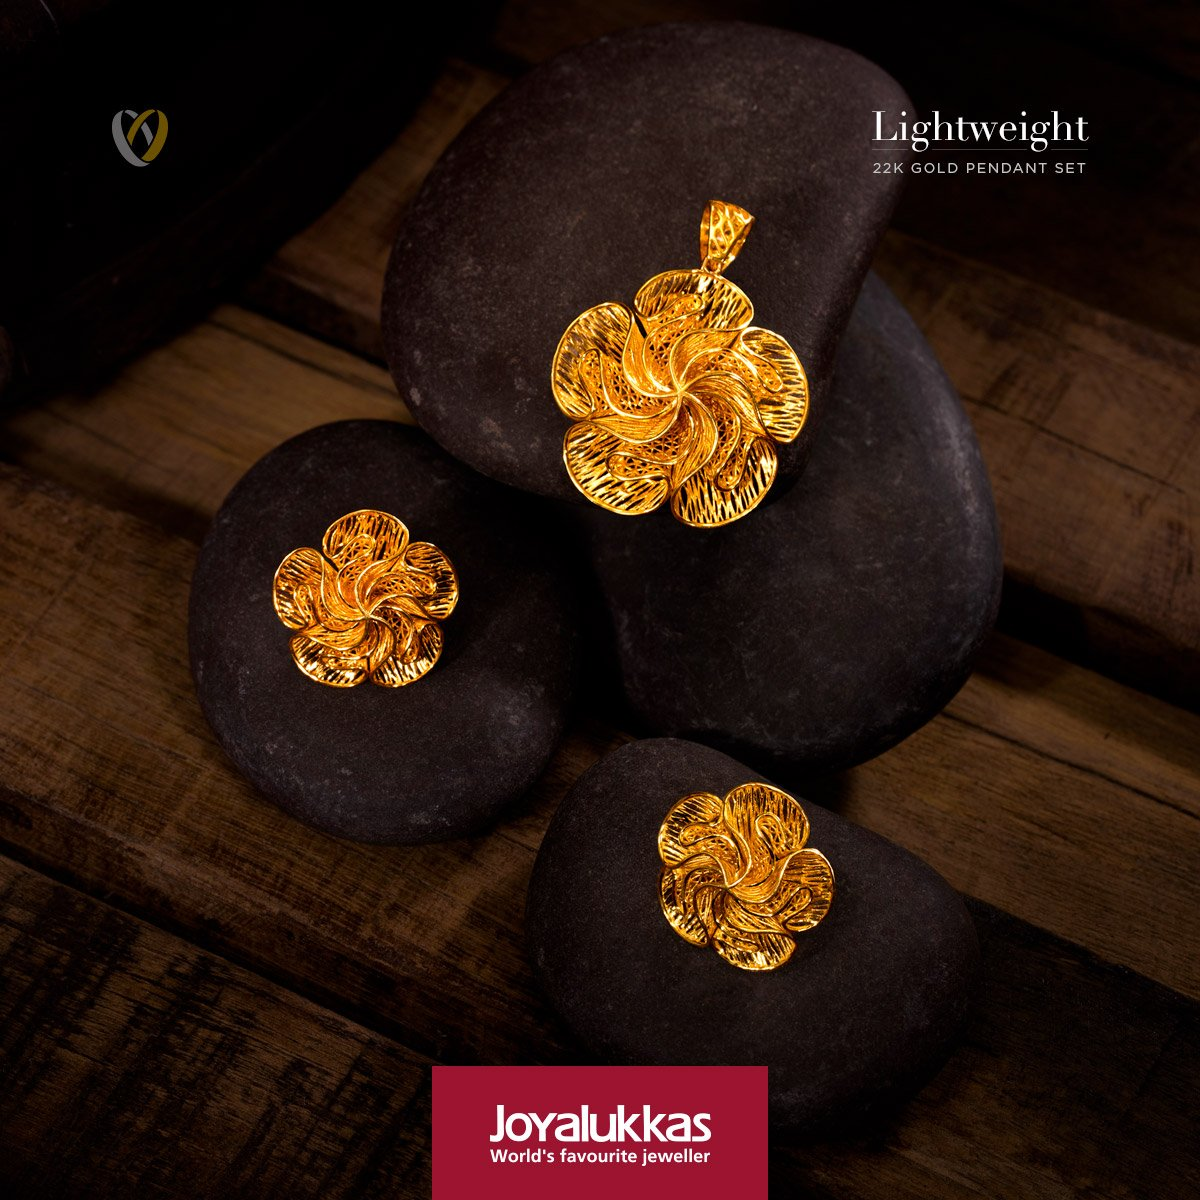 Joyalukkas india on twitter joyalukkas lightweight pendant set joyalukkas presents a beautiful lightweight turkish design pendant set in 22k gold crafted to showcase elegance at its best design no aloadofball Gallery